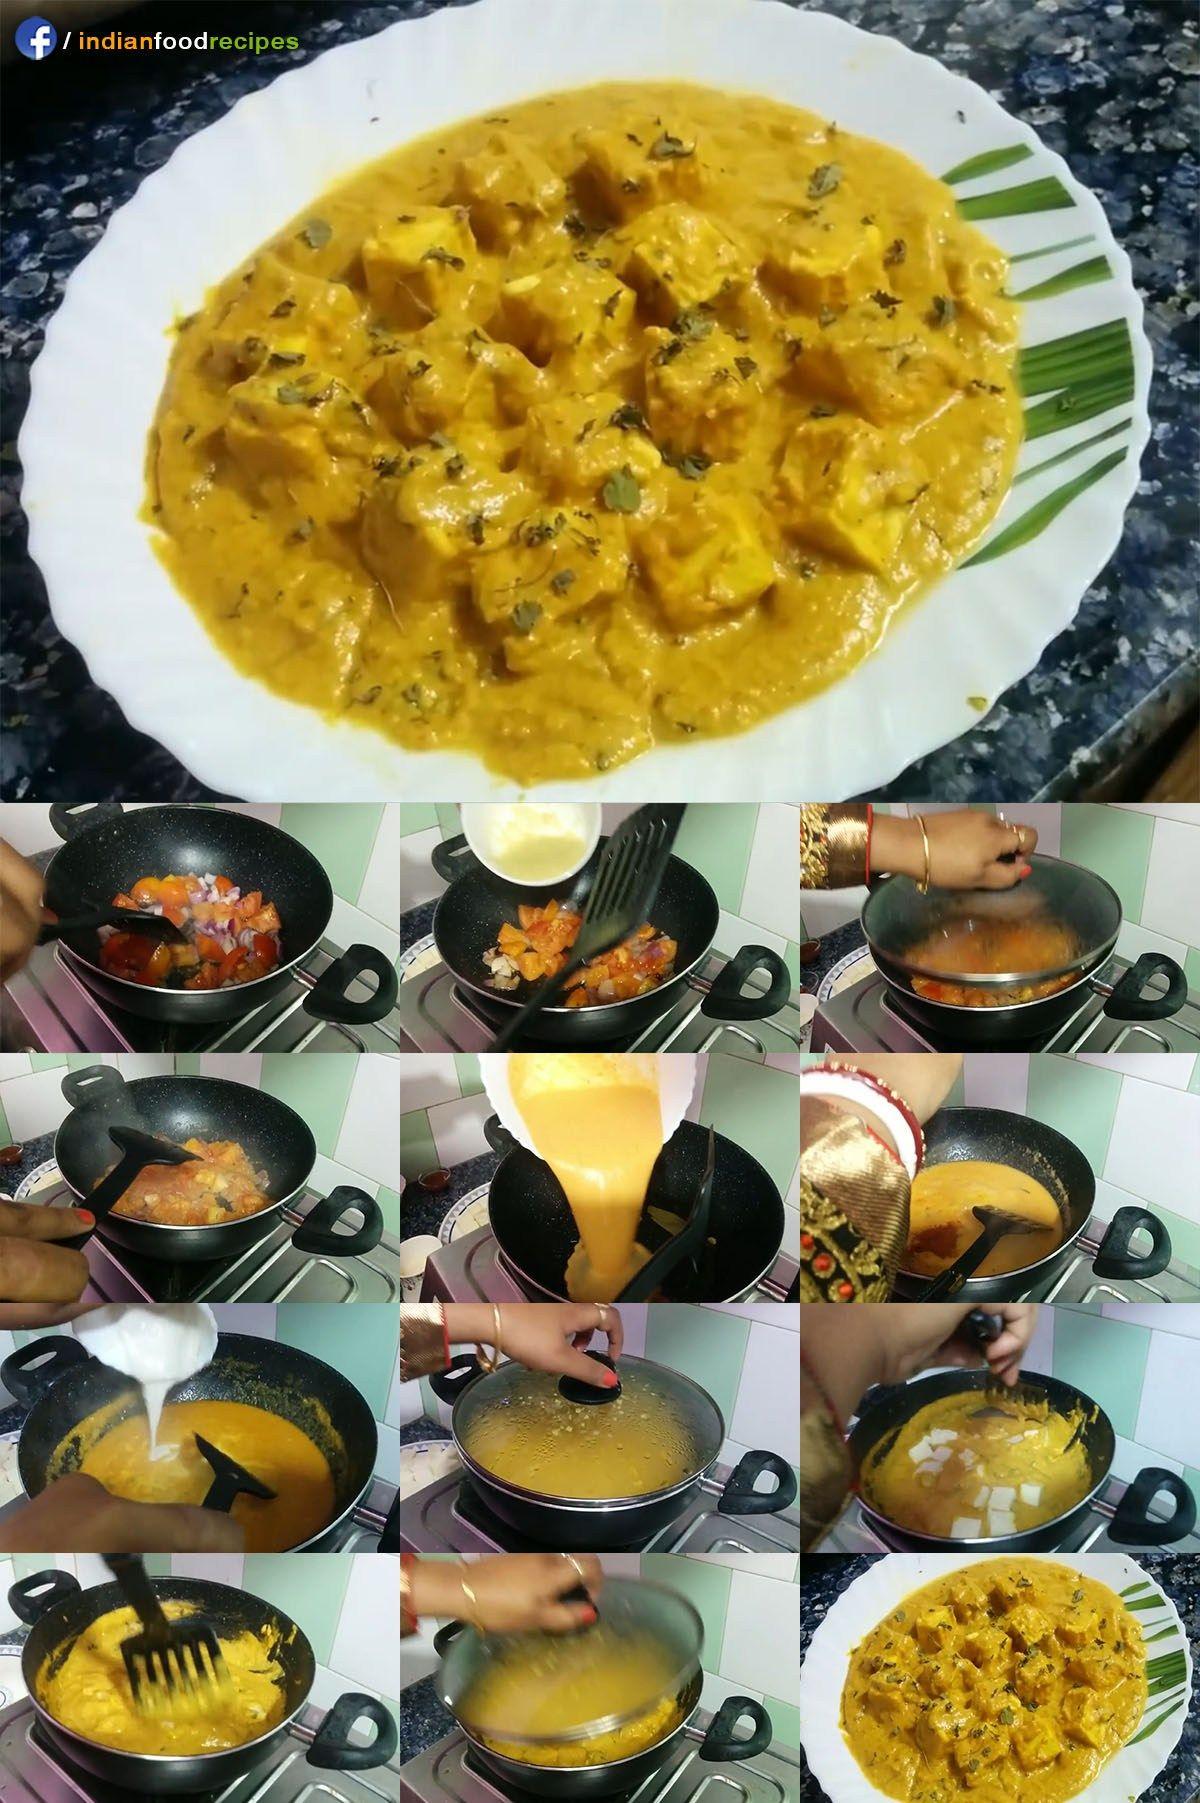 Shahi paneer recipe punjabi dhaba style recipe step by step shahi paneer recipe punjabi dhaba style recipe step by step punjabi recipesindian food forumfinder Gallery